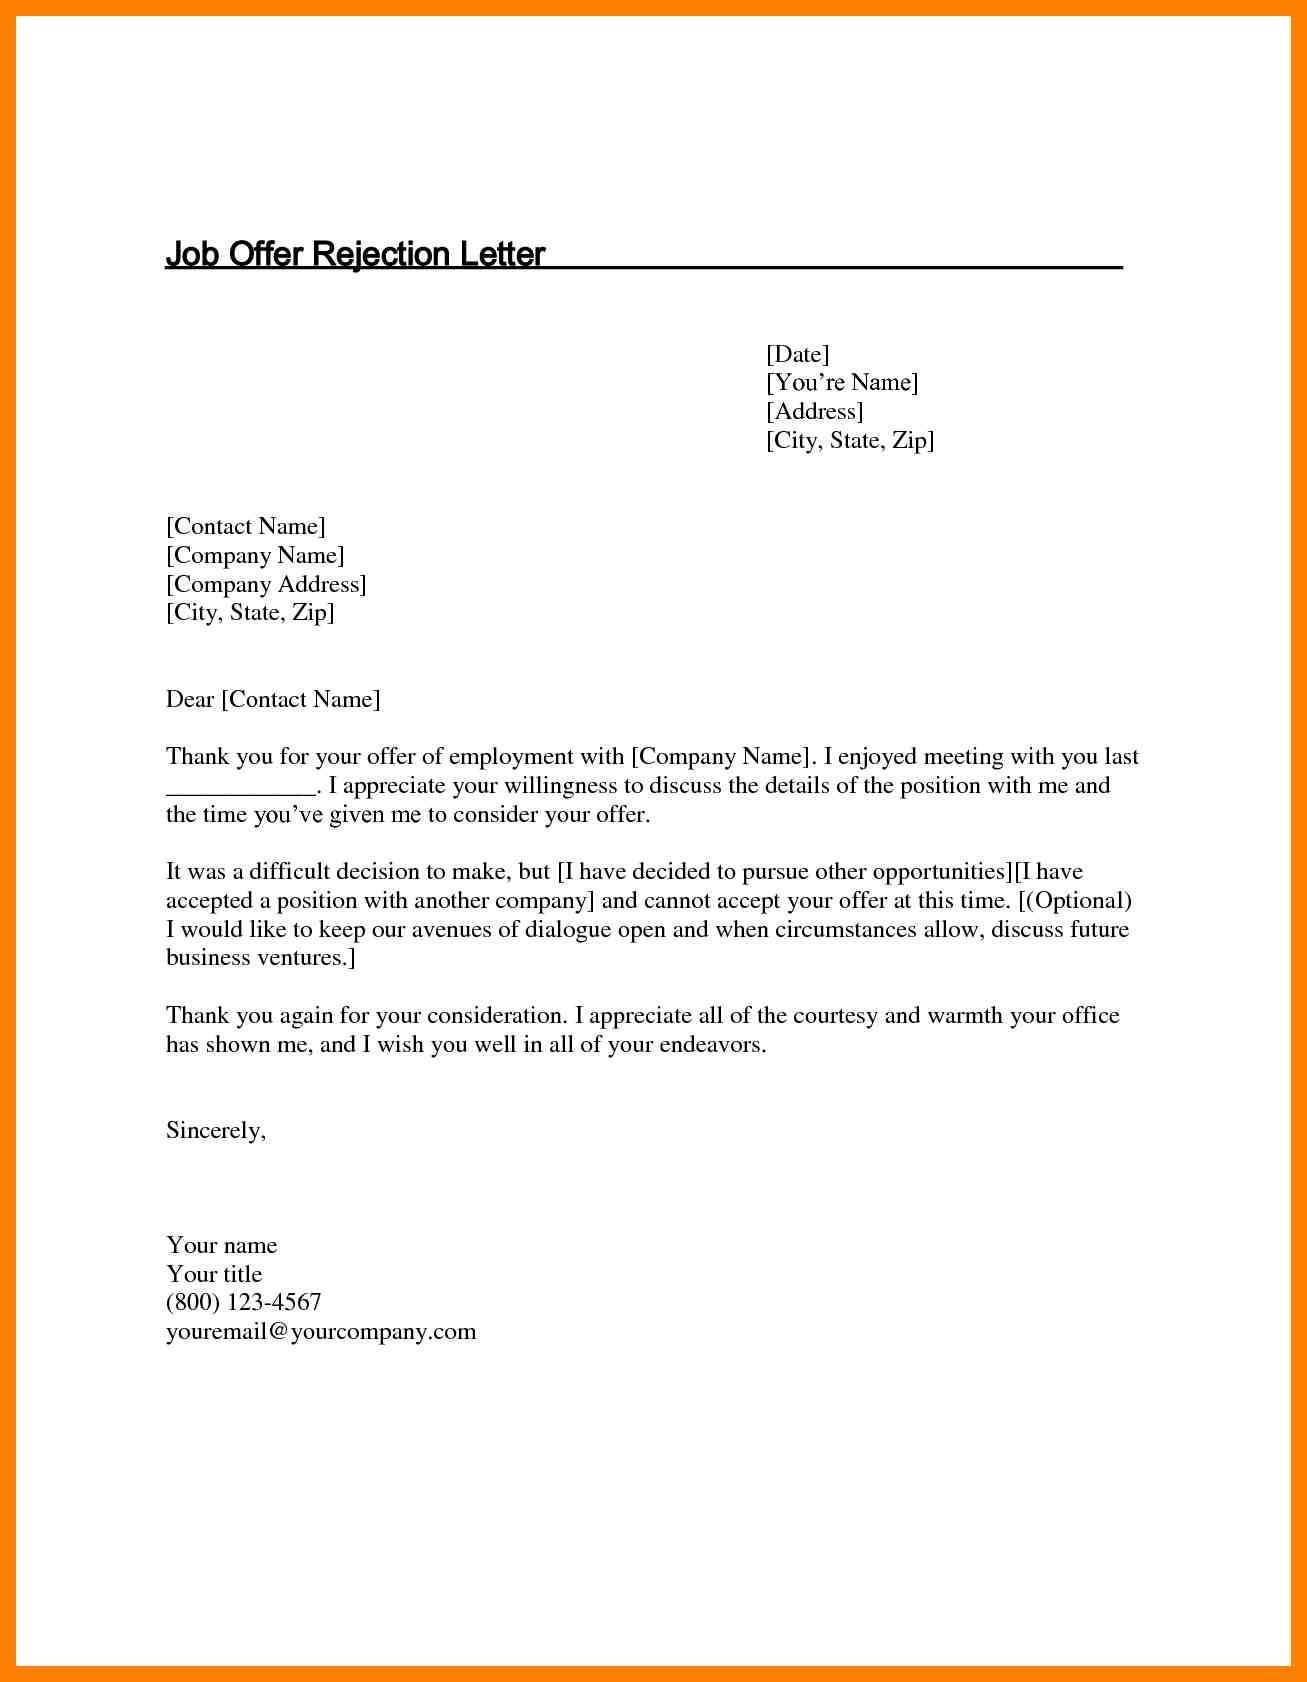 Valid Reply Letter For Job Offer Sample You Can Download For Full Letter Resume Template Here Http Newspb Org Reply Lett Job Rejection Lettering Job Letter